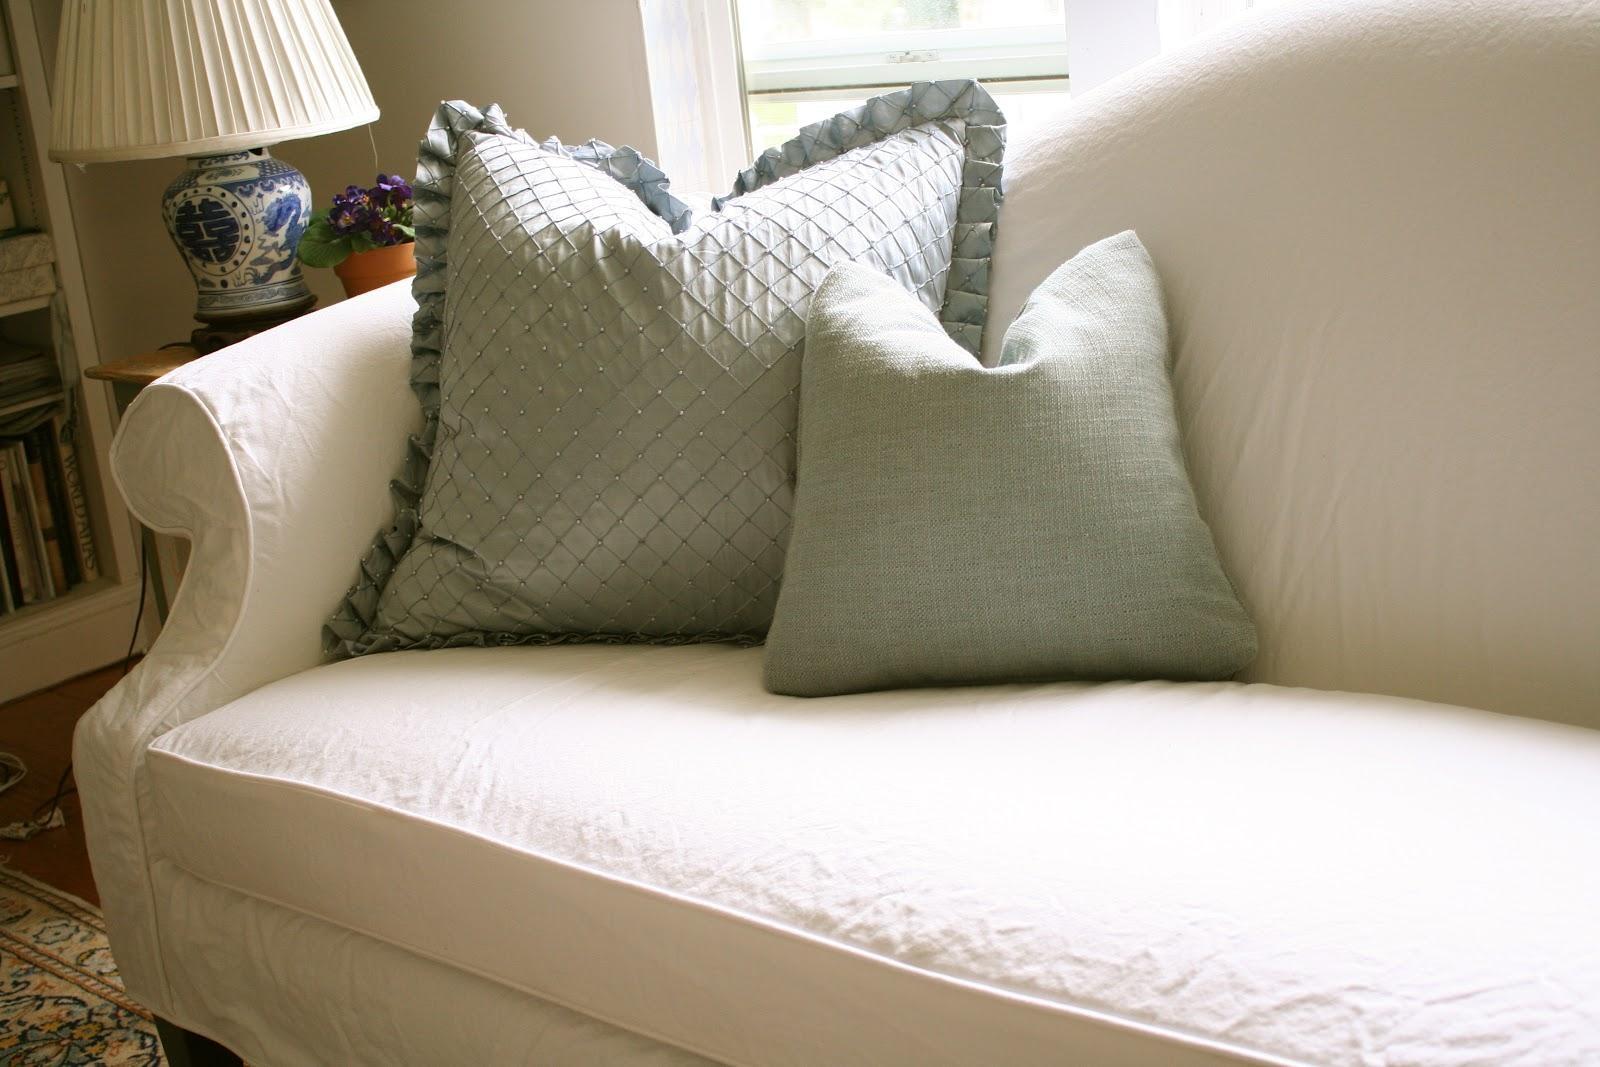 Custom Slipcoversshelley: White Camel Back Couch Regarding Camel Back Sofa Slipcovers (Image 10 of 20)